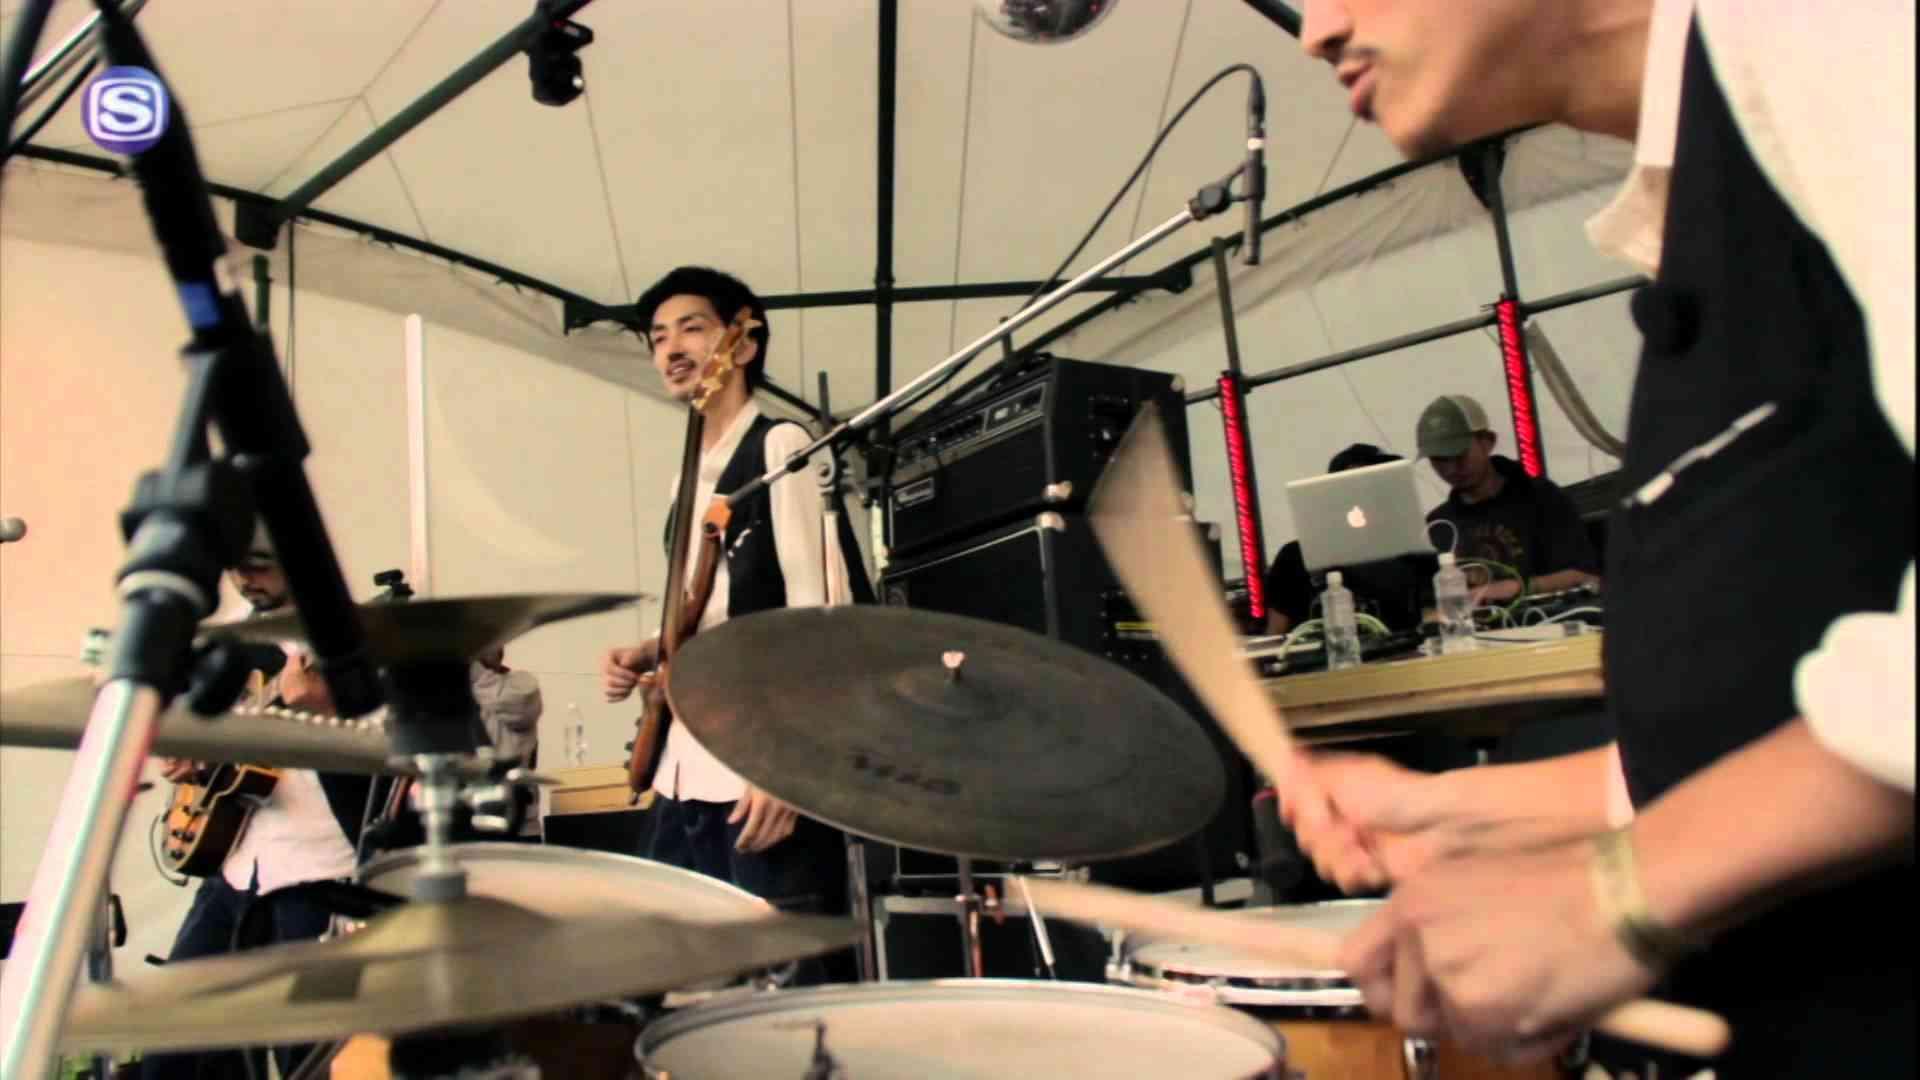 jizue - dance @ りんご音楽祭2014 - YouTube